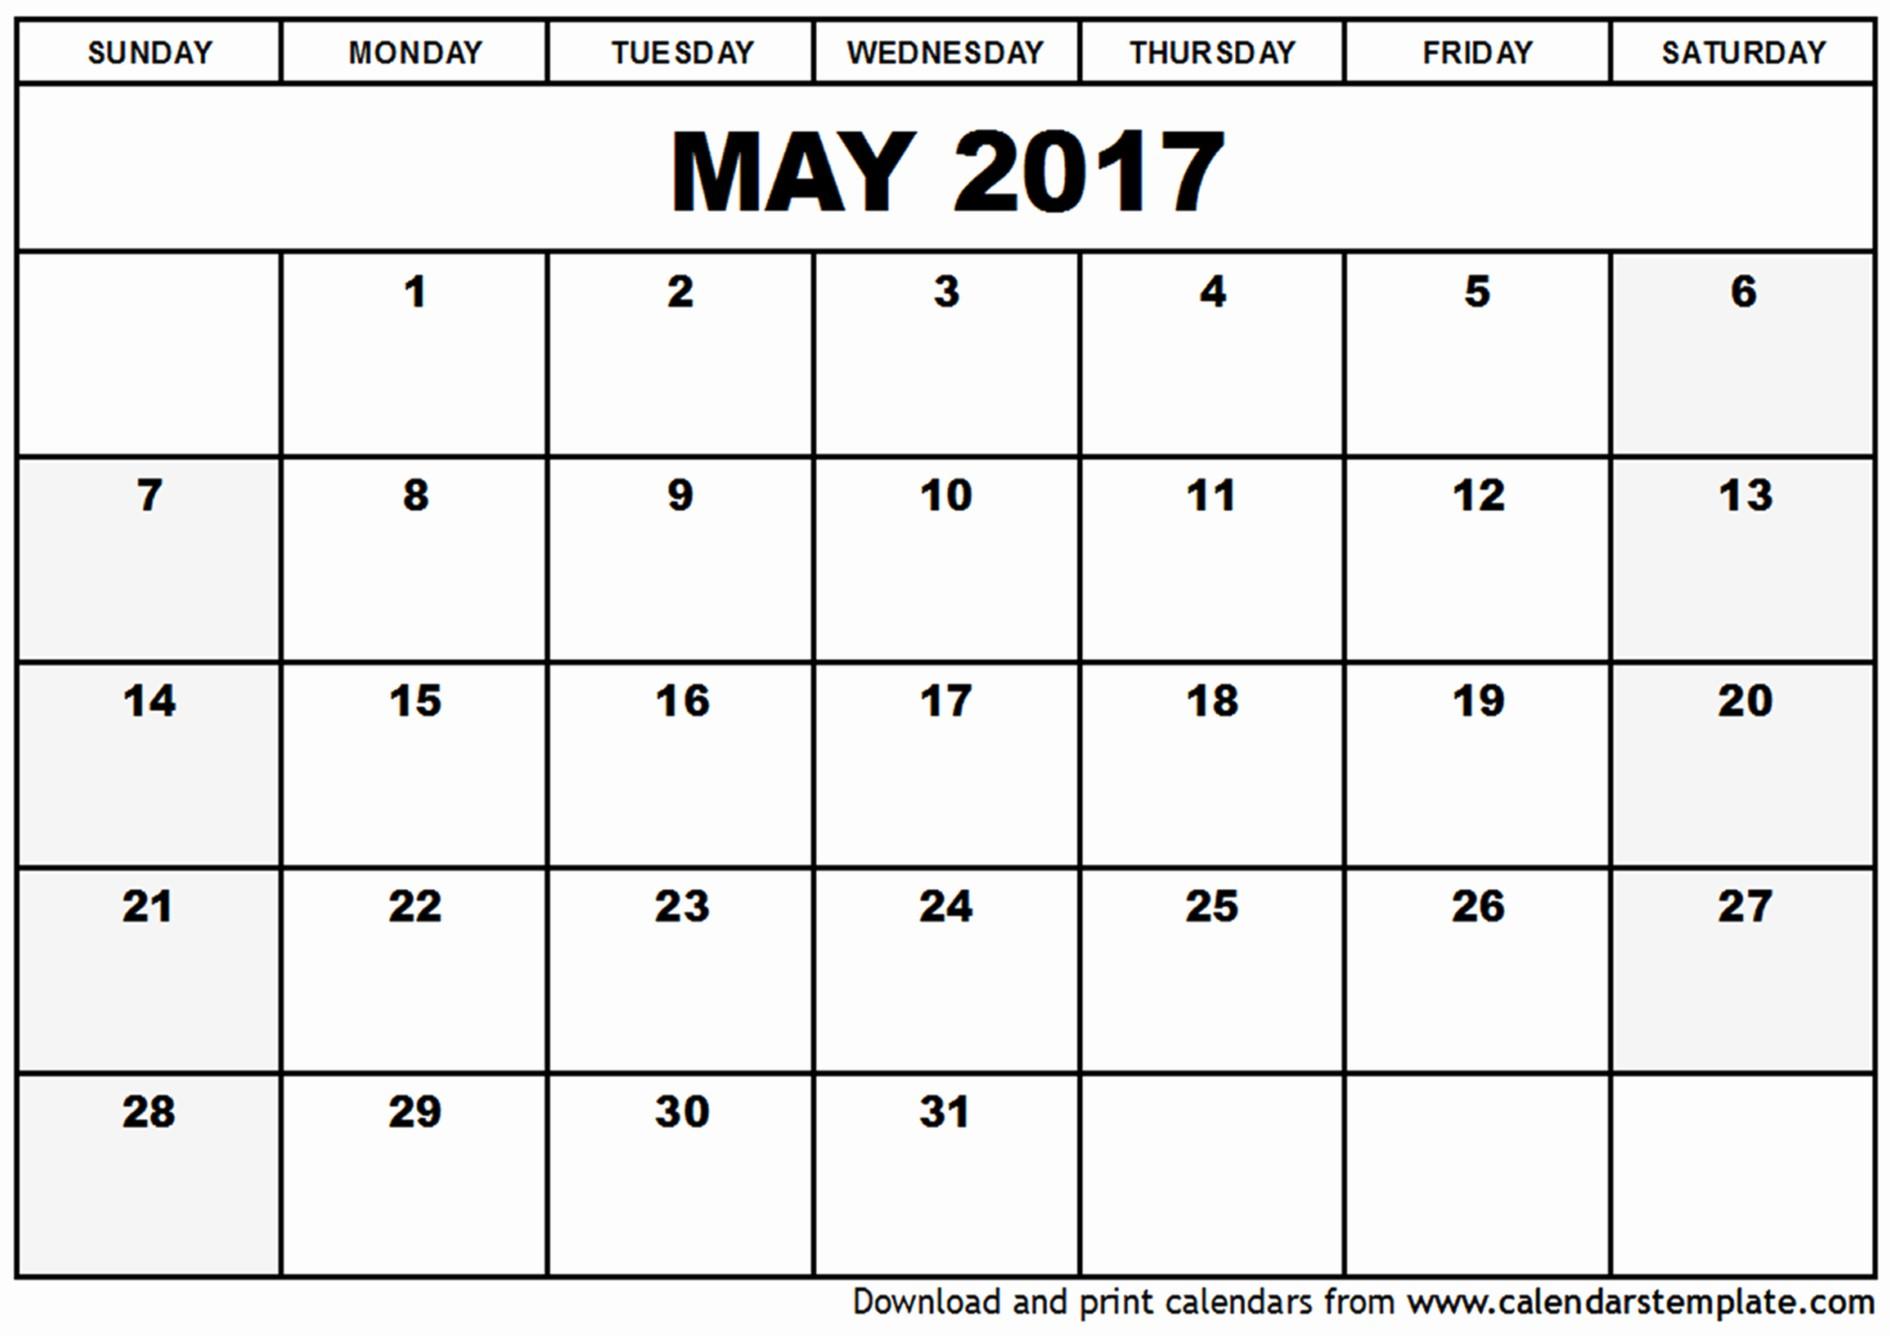 September 2017 Printable Calendar Word Best Of Inspirational Free Printable Monthly Calendar September